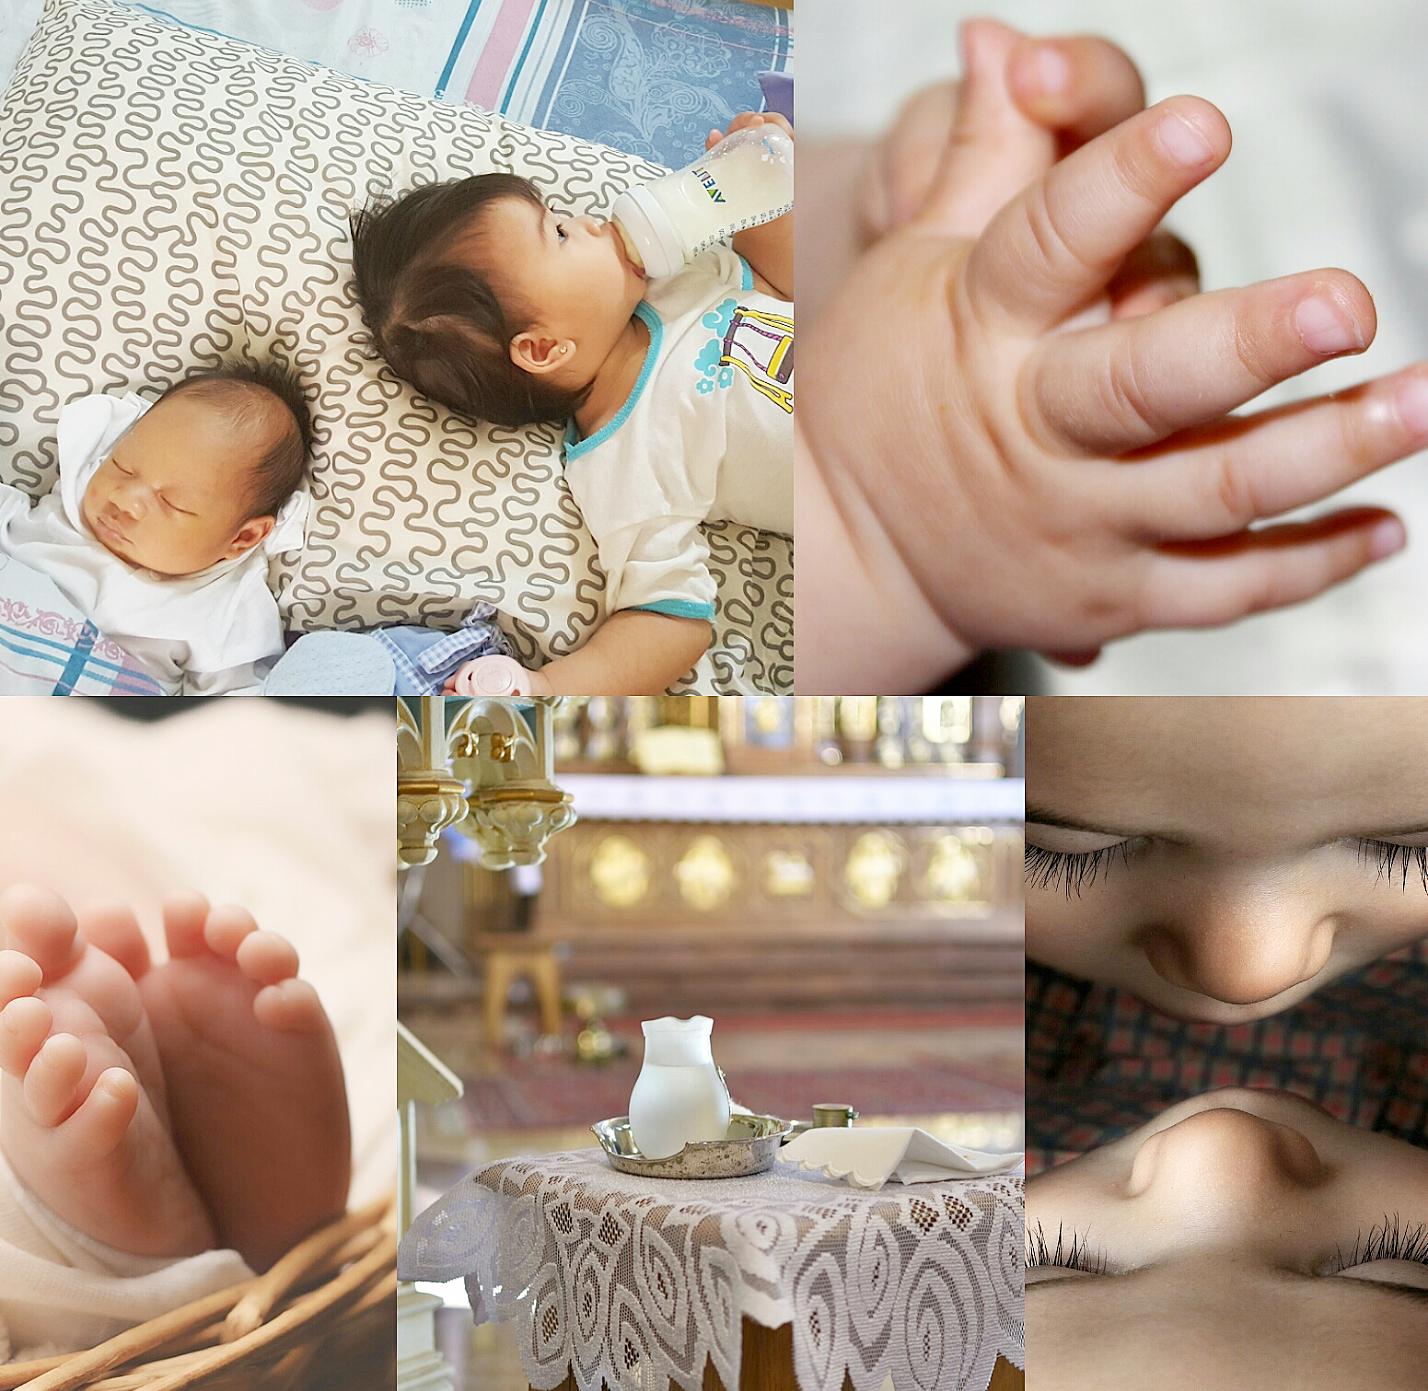 Filipino Baby Beliefs